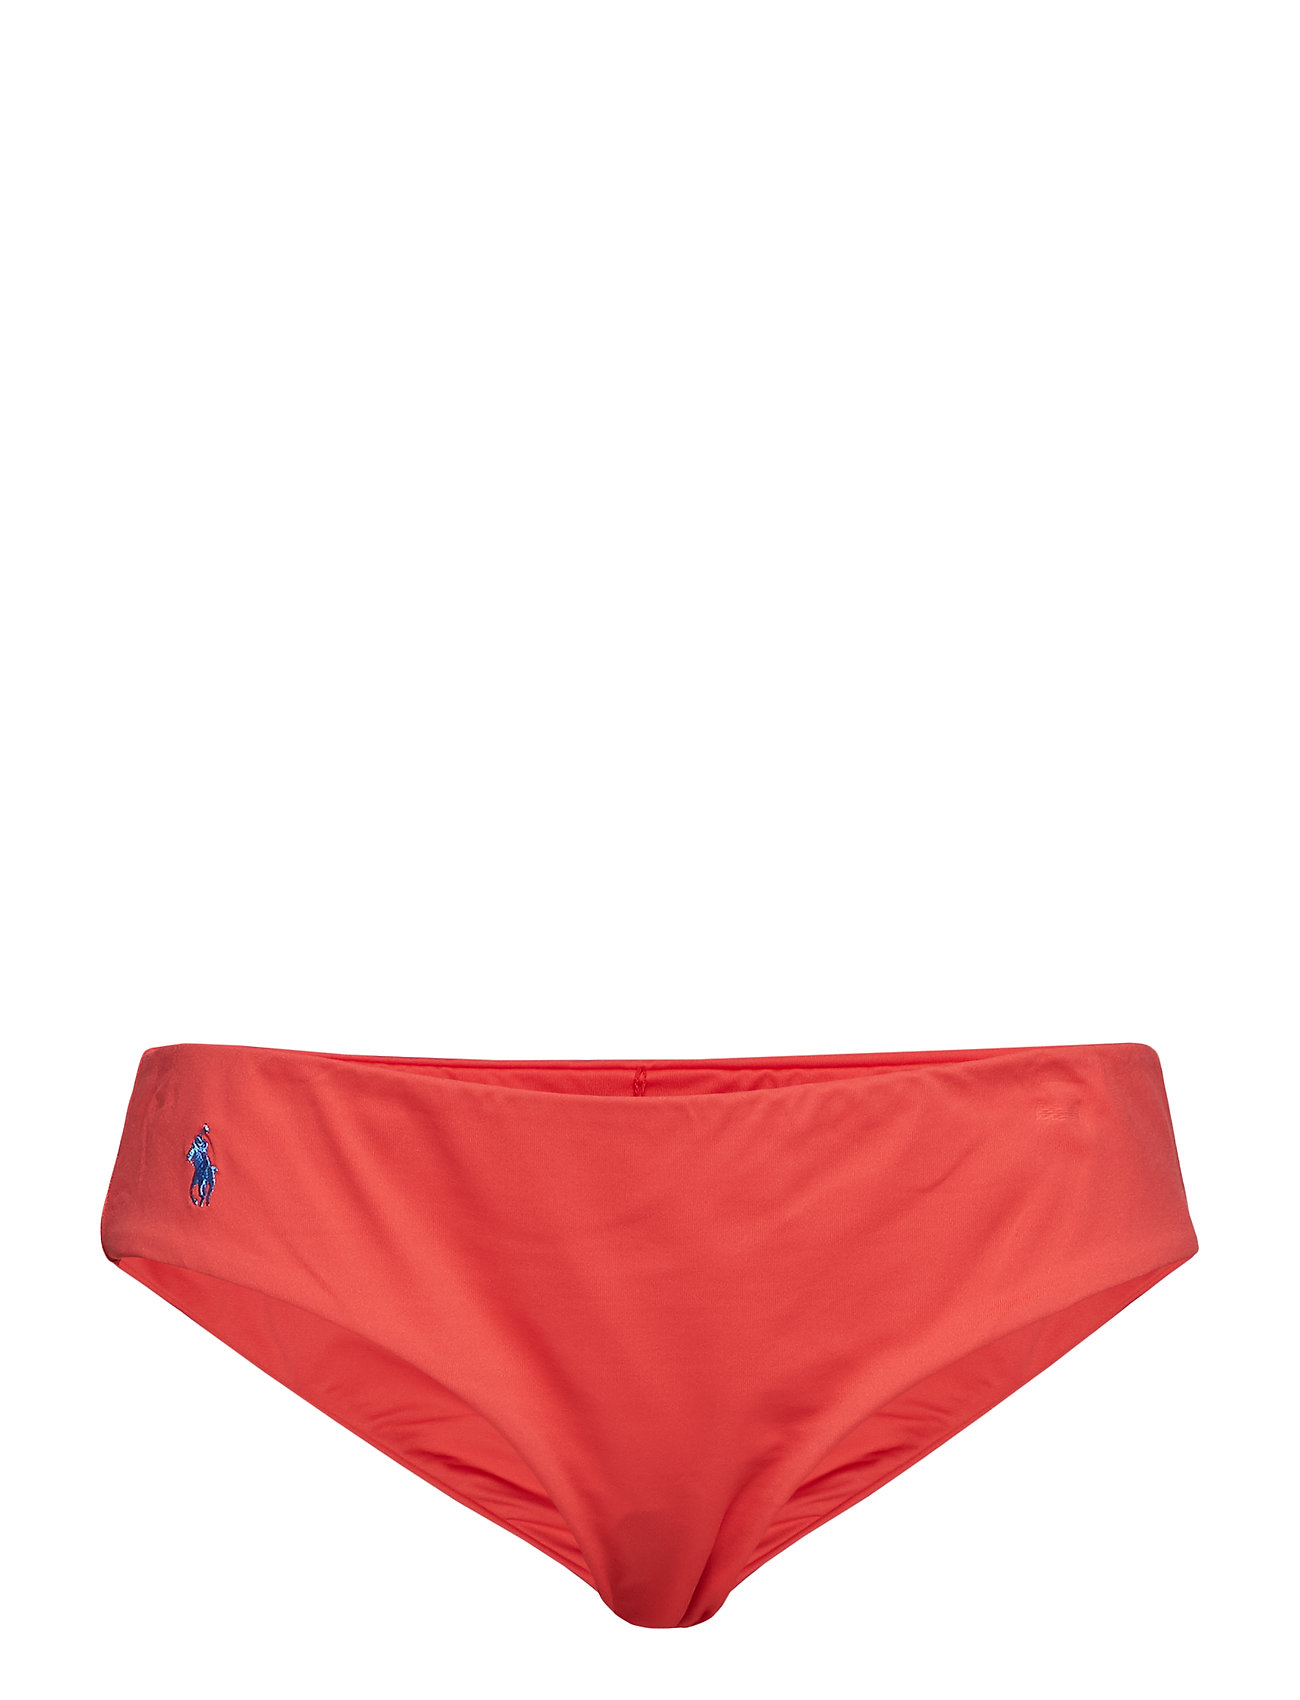 Polo Ralph Lauren Swimwear MODERN SOLIDS SURFER CUT HIPSTER Guava, X-Small - GUAVA